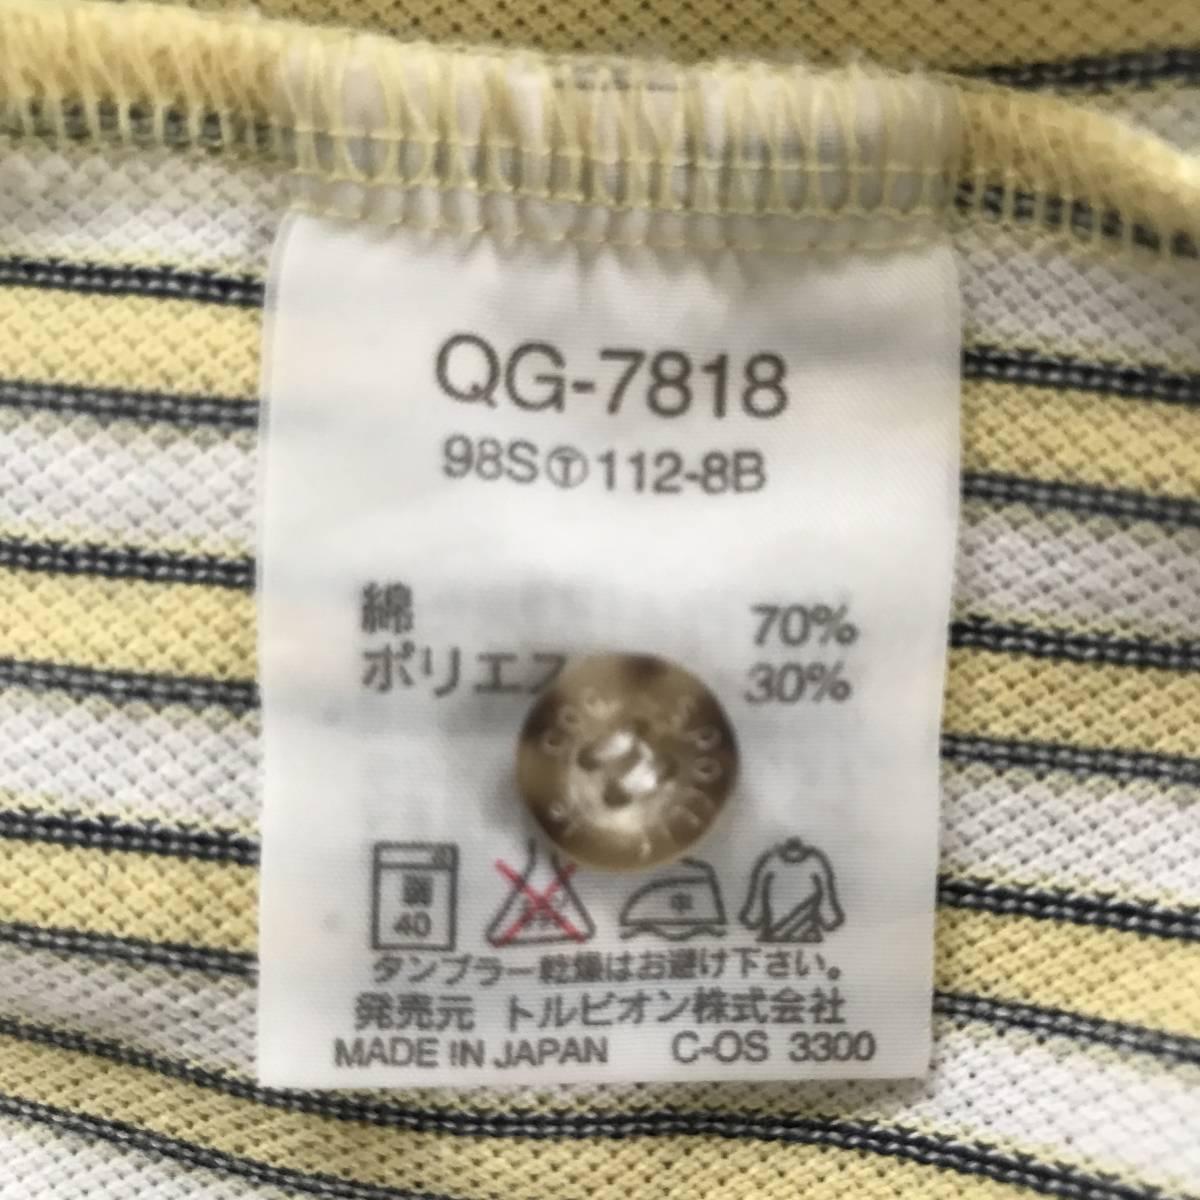 le coq sportif GOLF COLLECTION ルコック ゴルフ メンズ ストライプ柄 ロゴ刺繍入り 半袖 速乾ストレッチポロシャツ 美品 size S/L_画像8